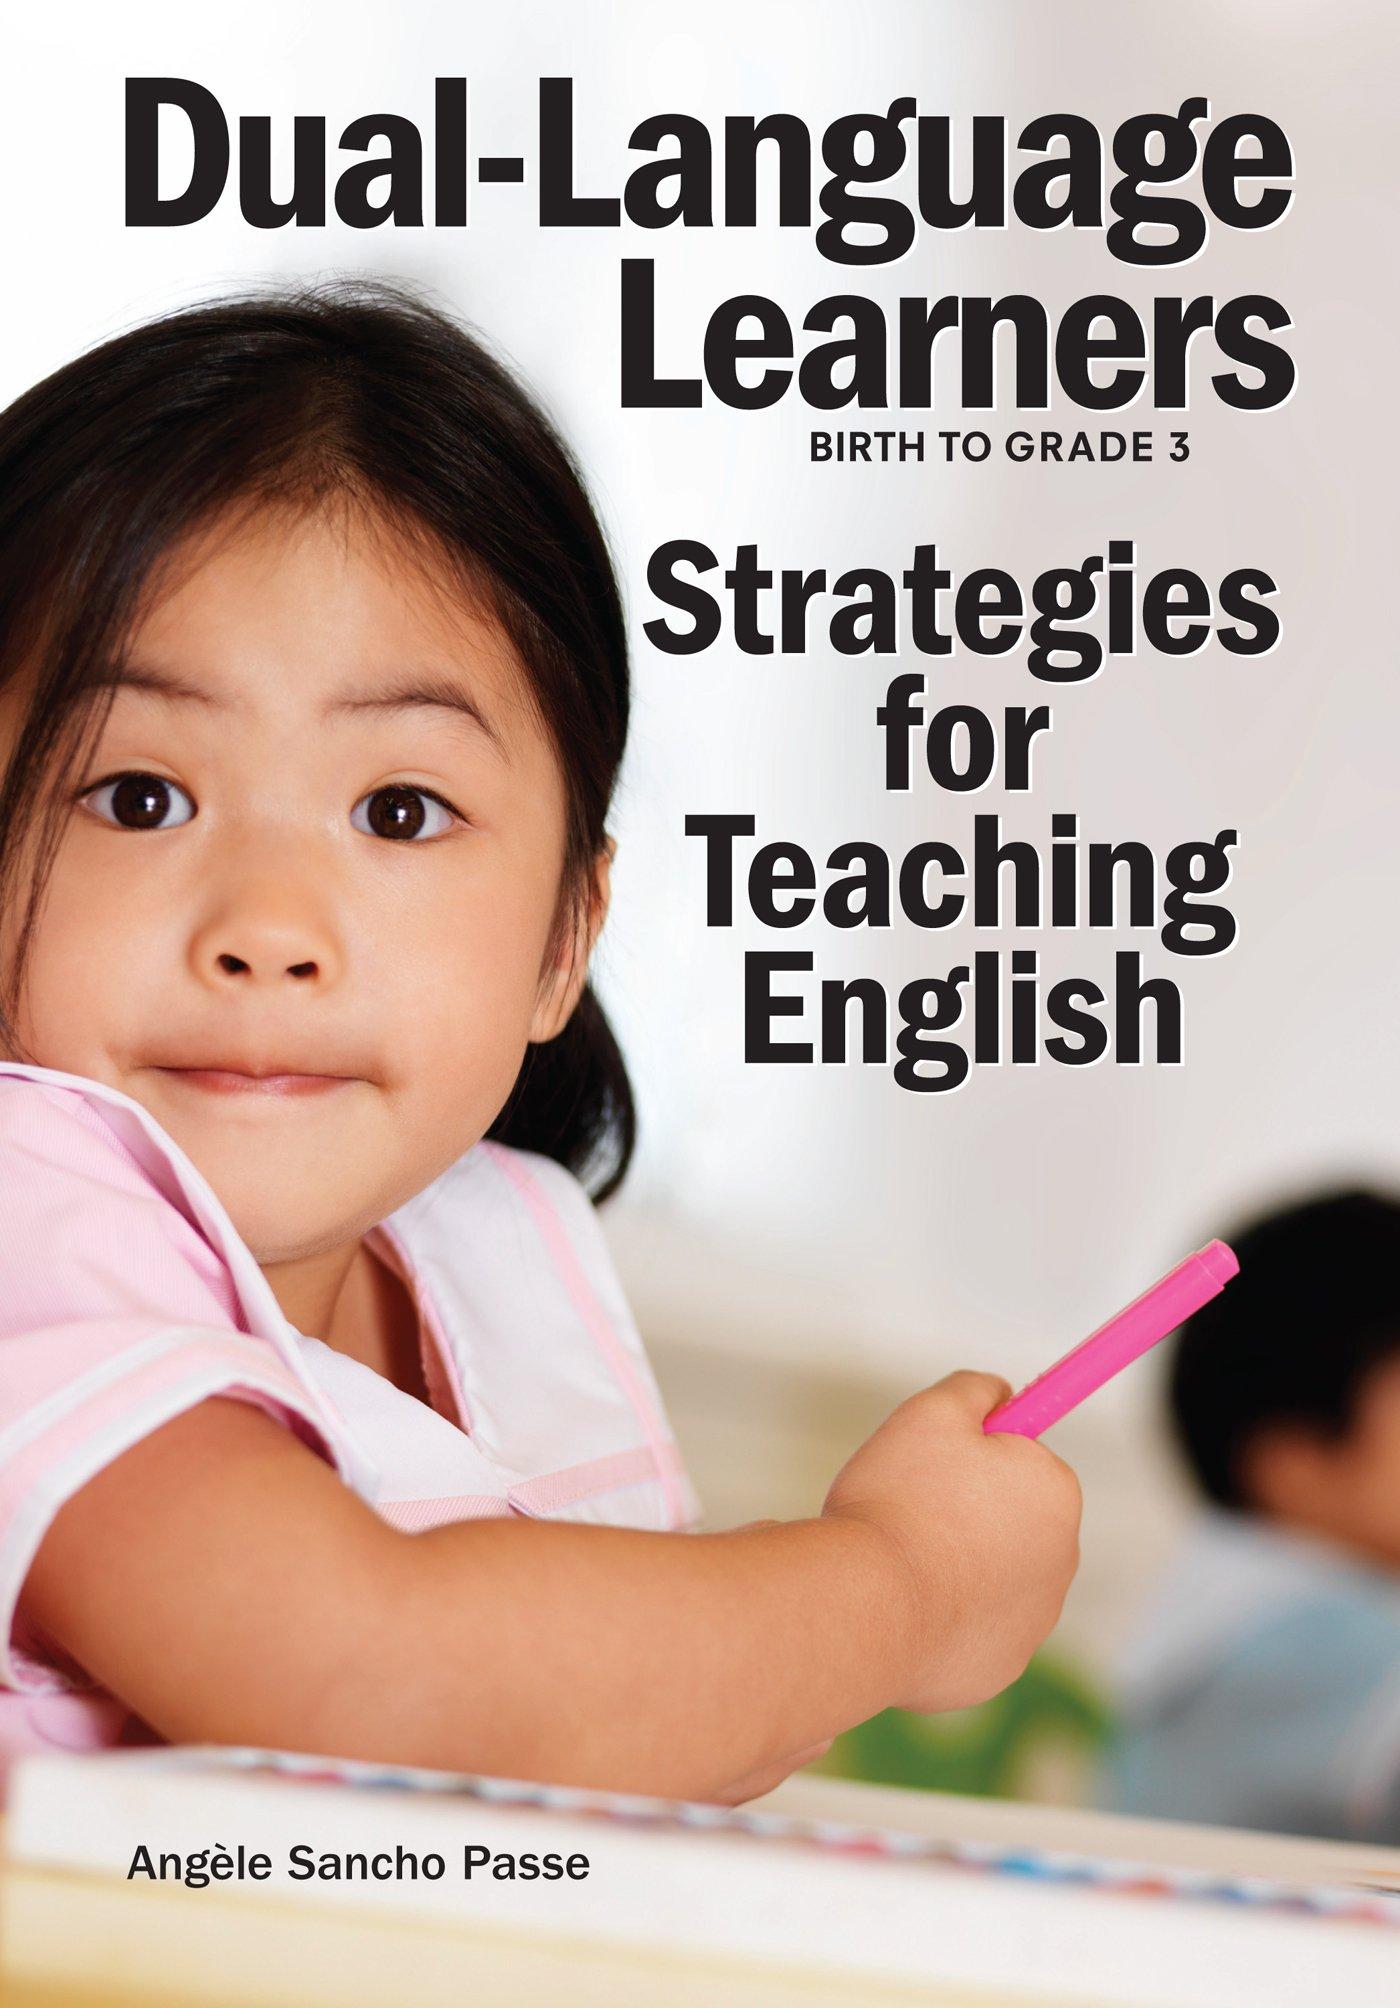 Dual-Language Learners: Strategies for Teaching English